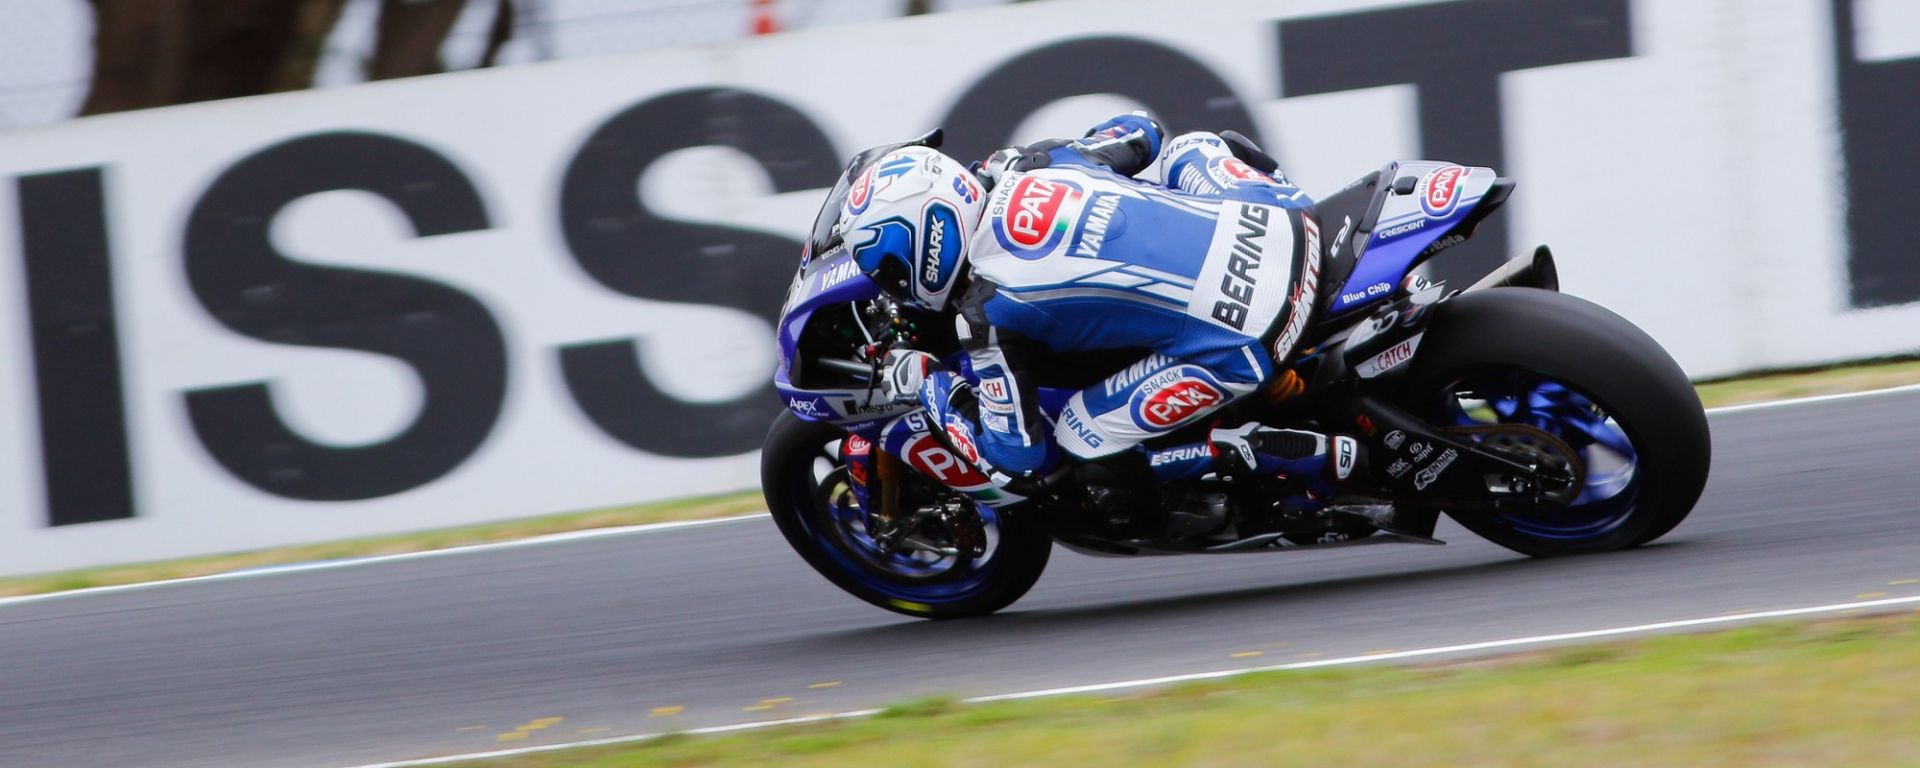 Il pilota Yamaha Sylvain Guintoli il più veloce nelle libere